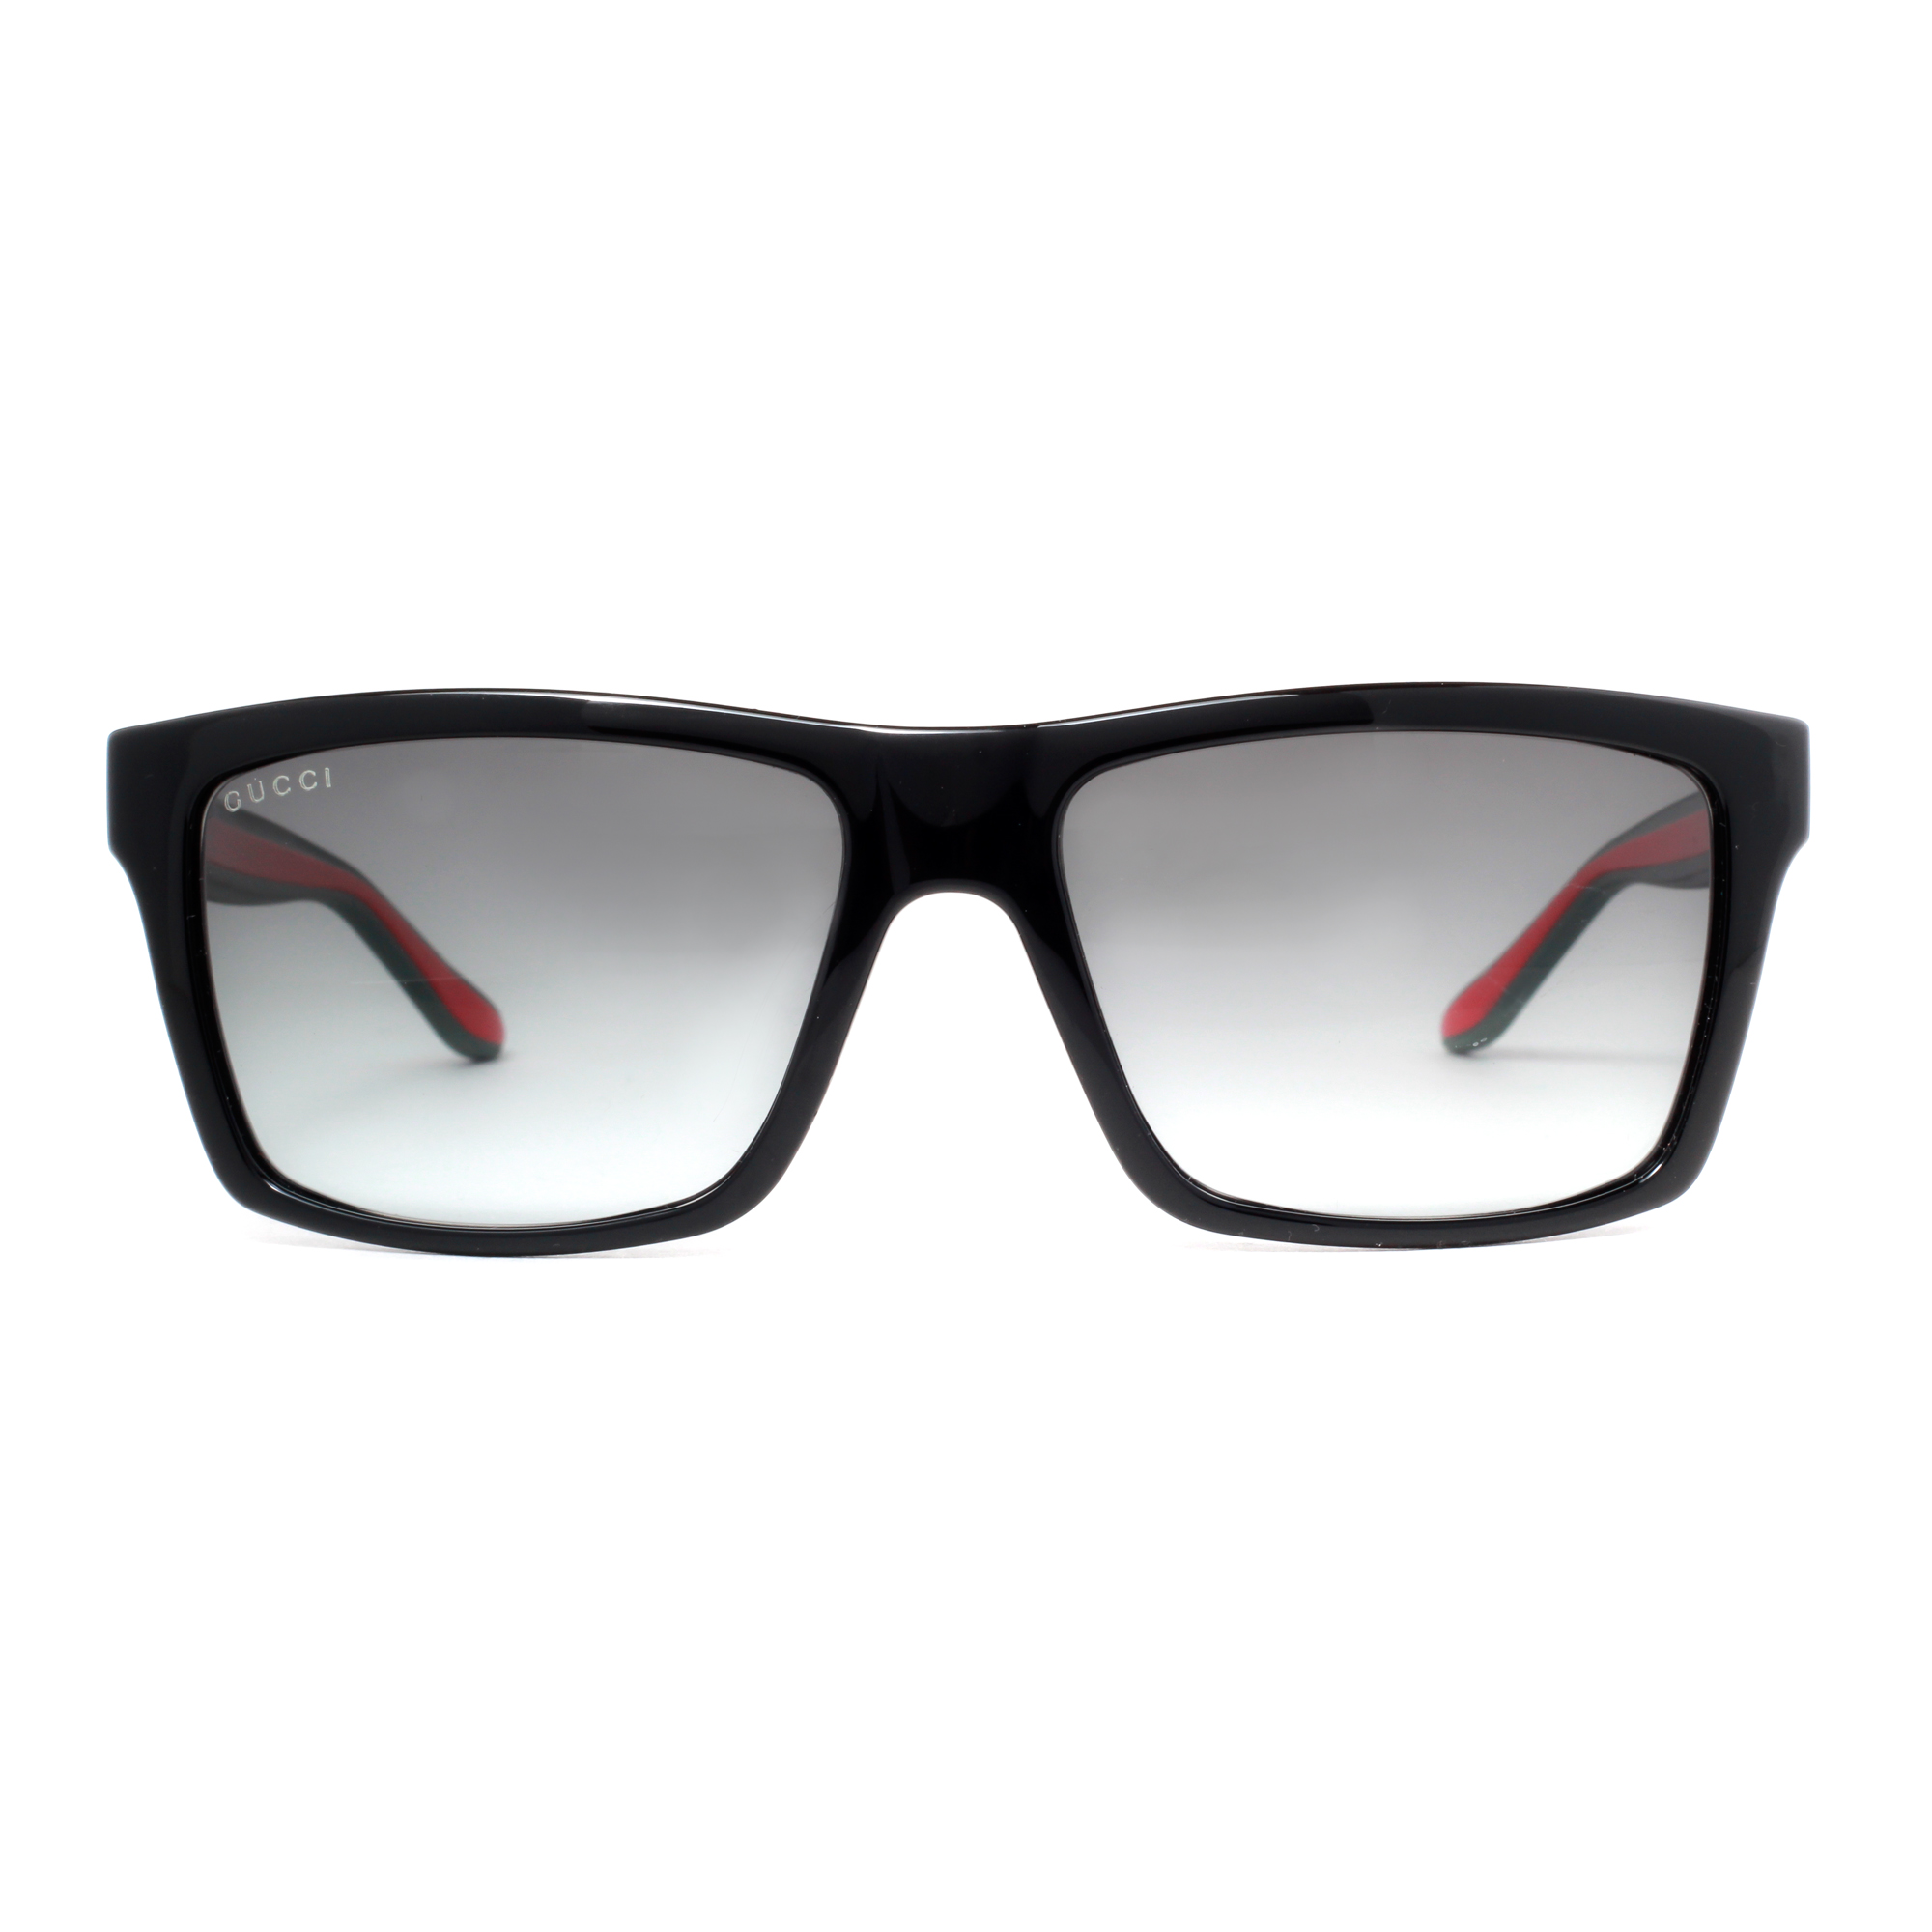 f6e9716e7fb Gucci GG 1013 S 51N PT Shiny Black Grey Gradient Rectangular Sunglasses